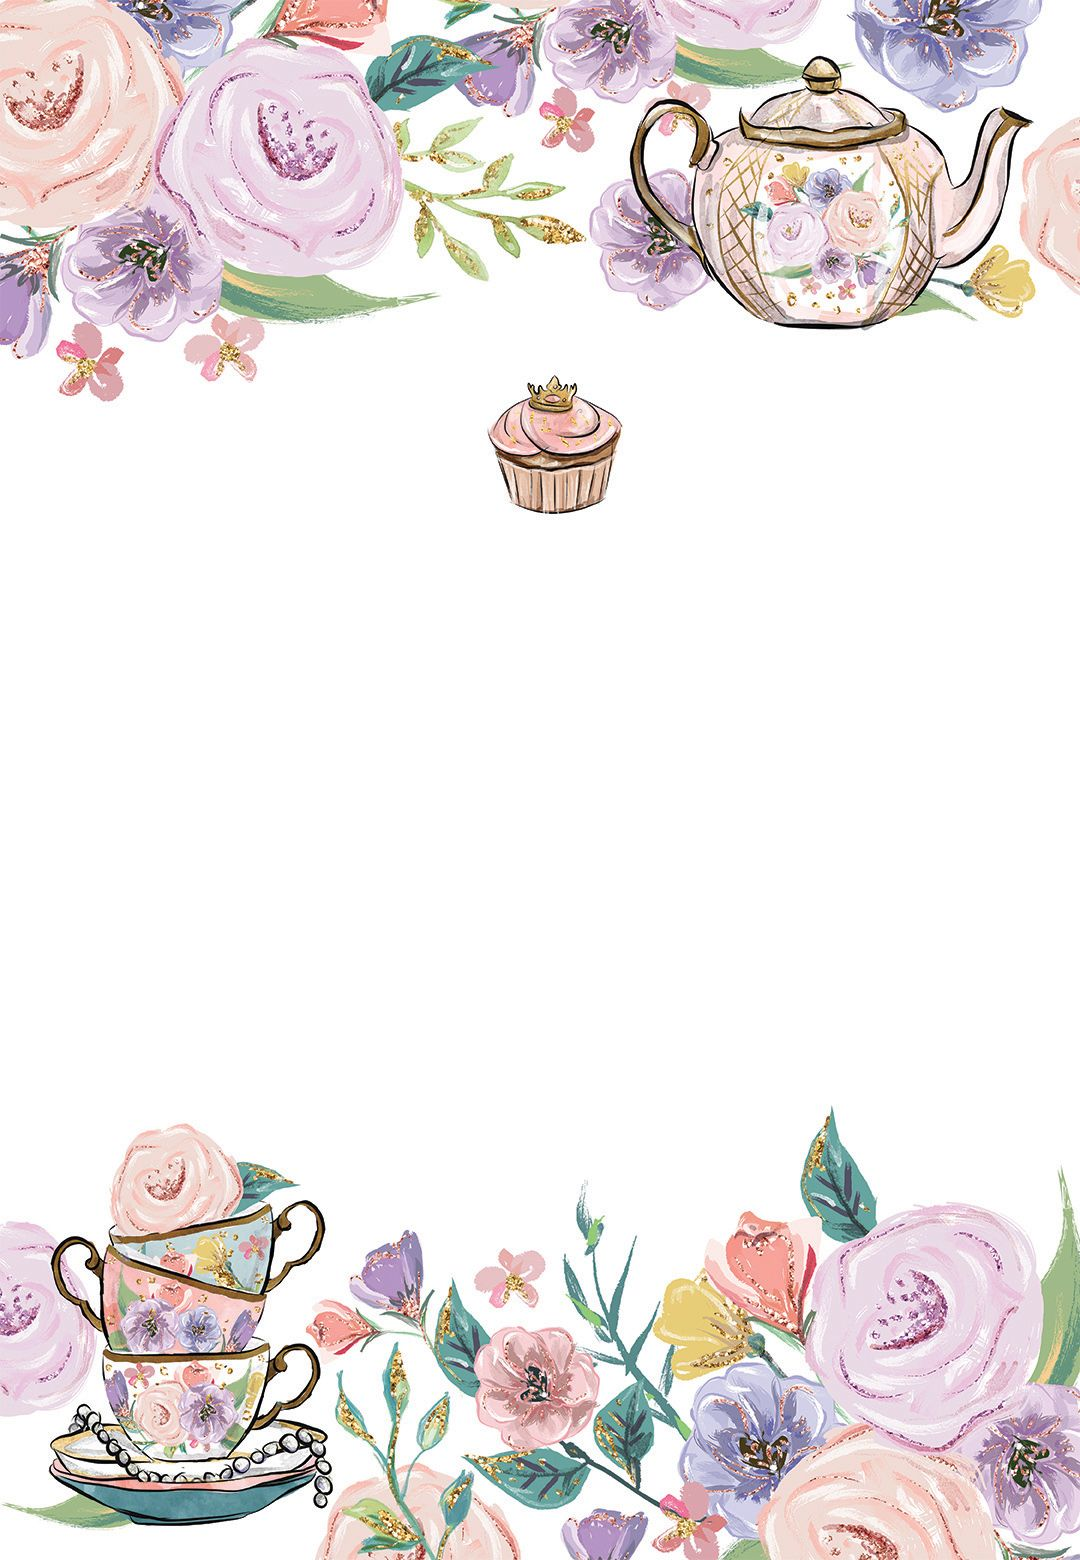 Princess Tea Party Birthday Invitation Template Free Greetings Island Tea Party Invitations Princess Tea Party Birthday Tea Party Birthday